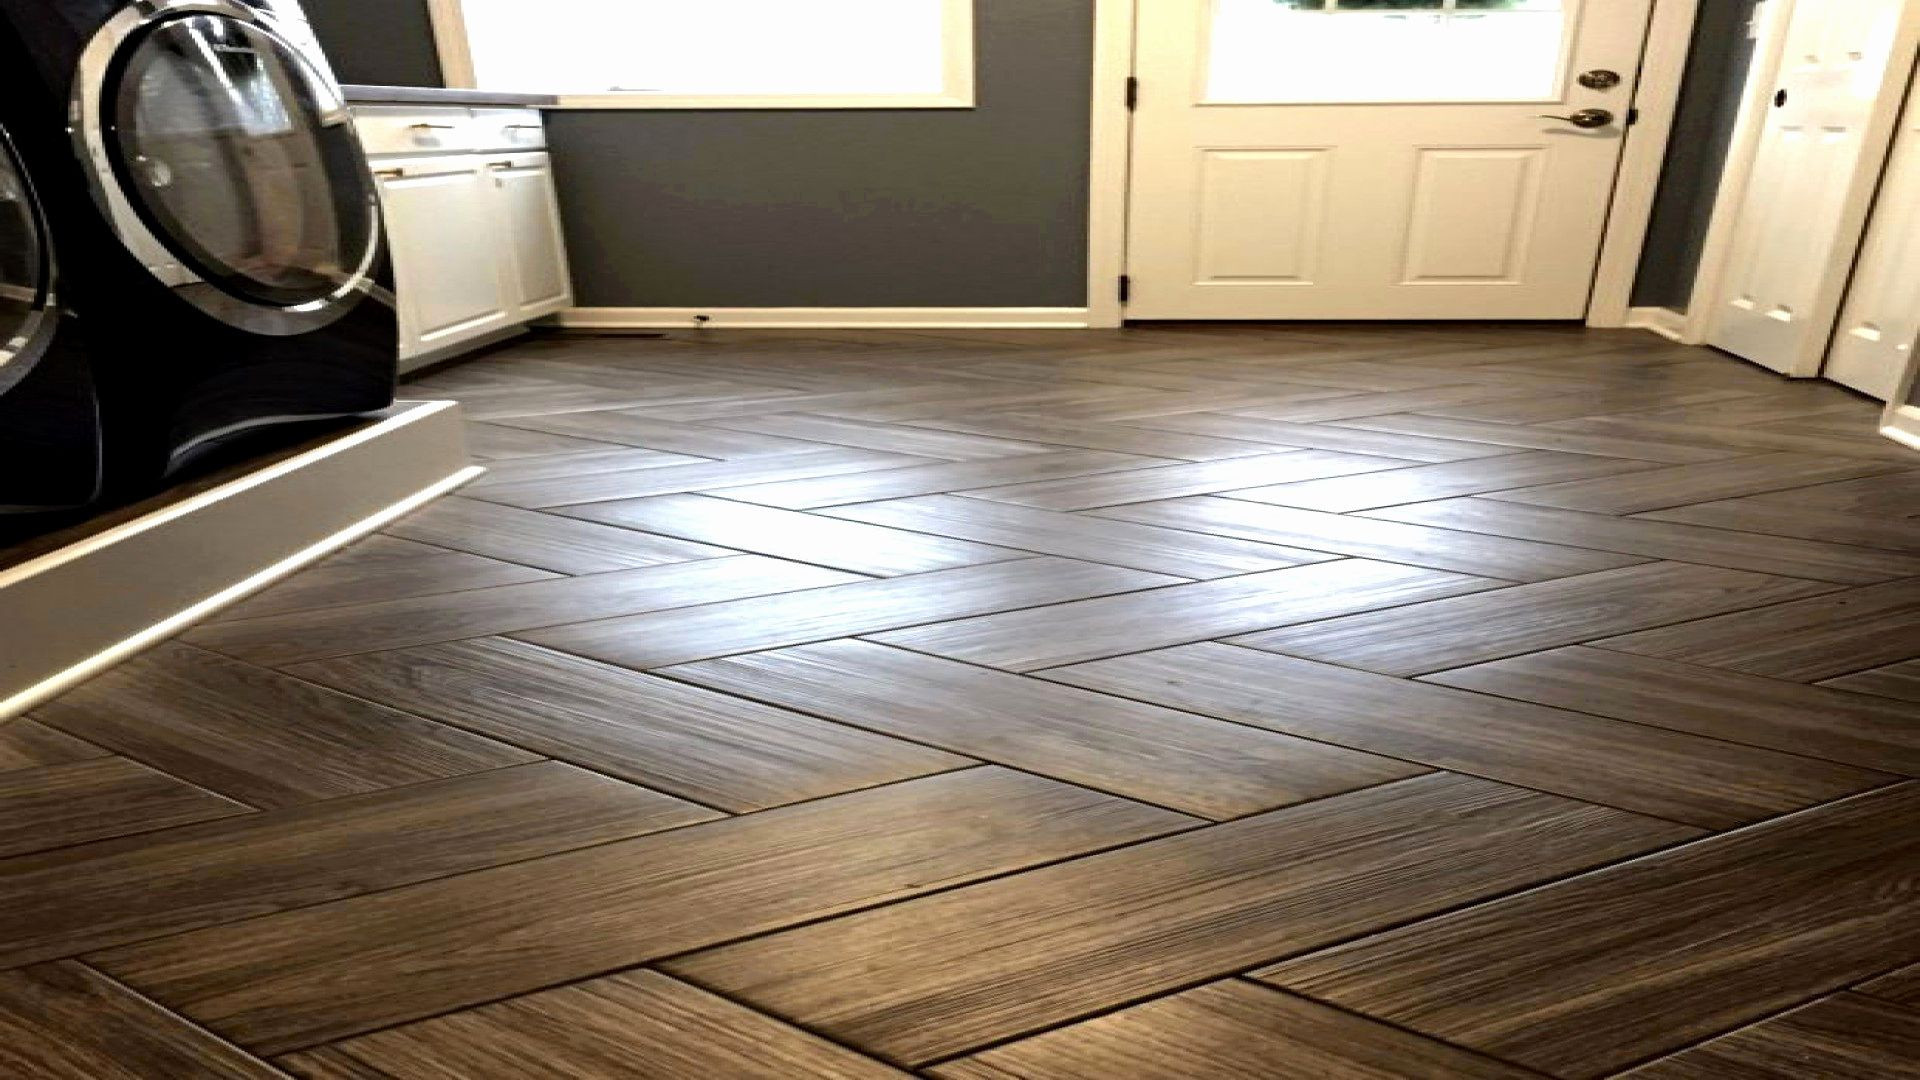 hardwood flooring and installation cost of wood flooring cost 40 how to install flooring concept floor plan ideas pertaining to wood flooring cost 40 how to install flooring concept